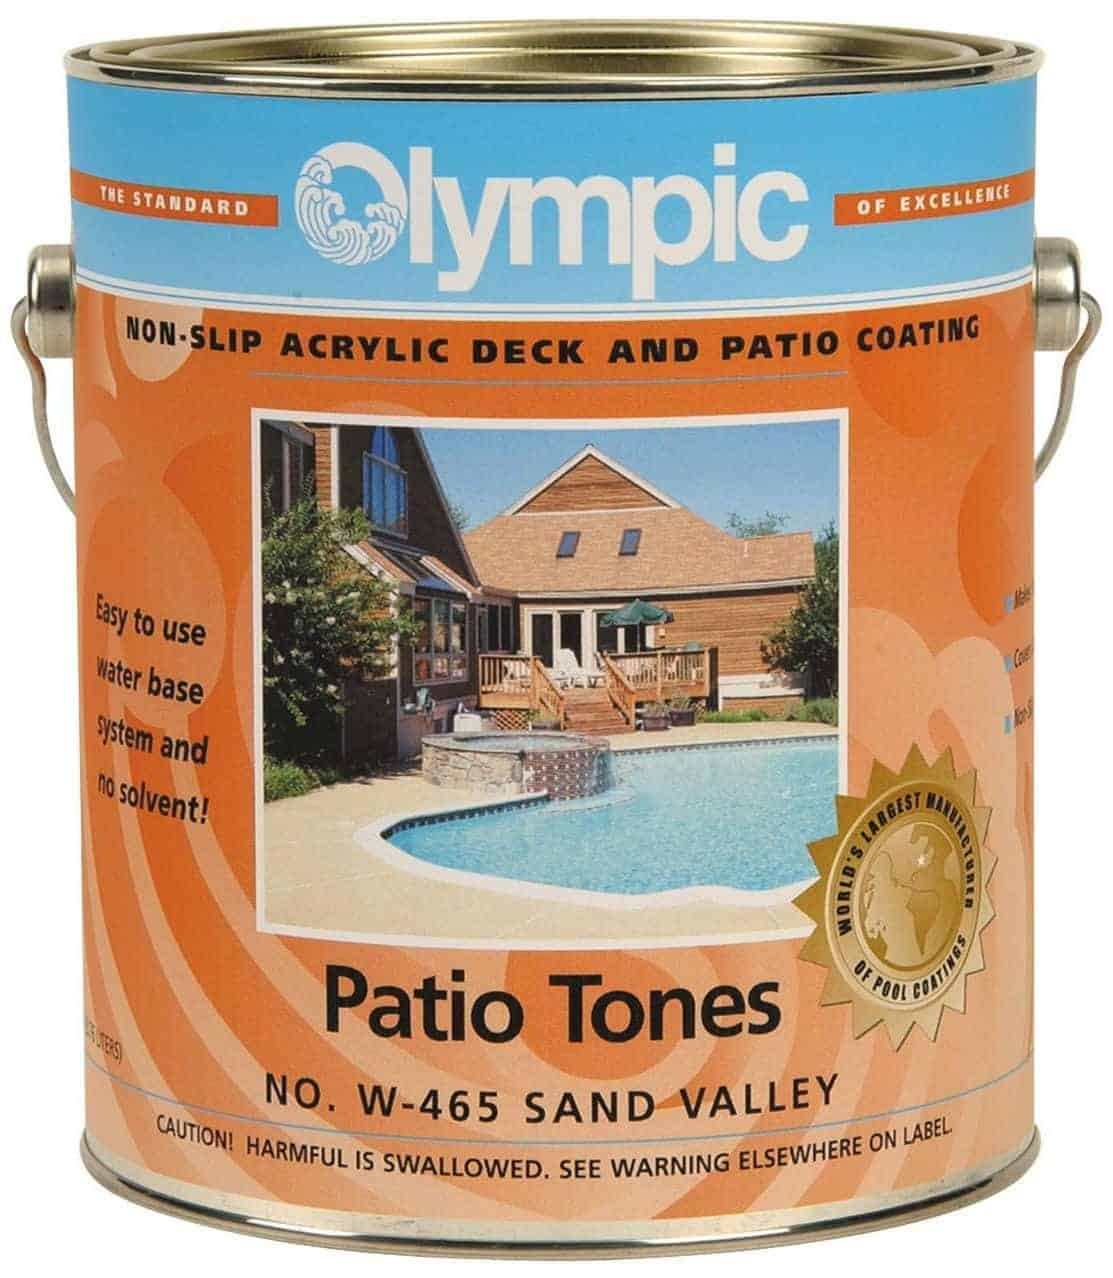 Olympic Patio Tones Deck Coating - Desert Sun